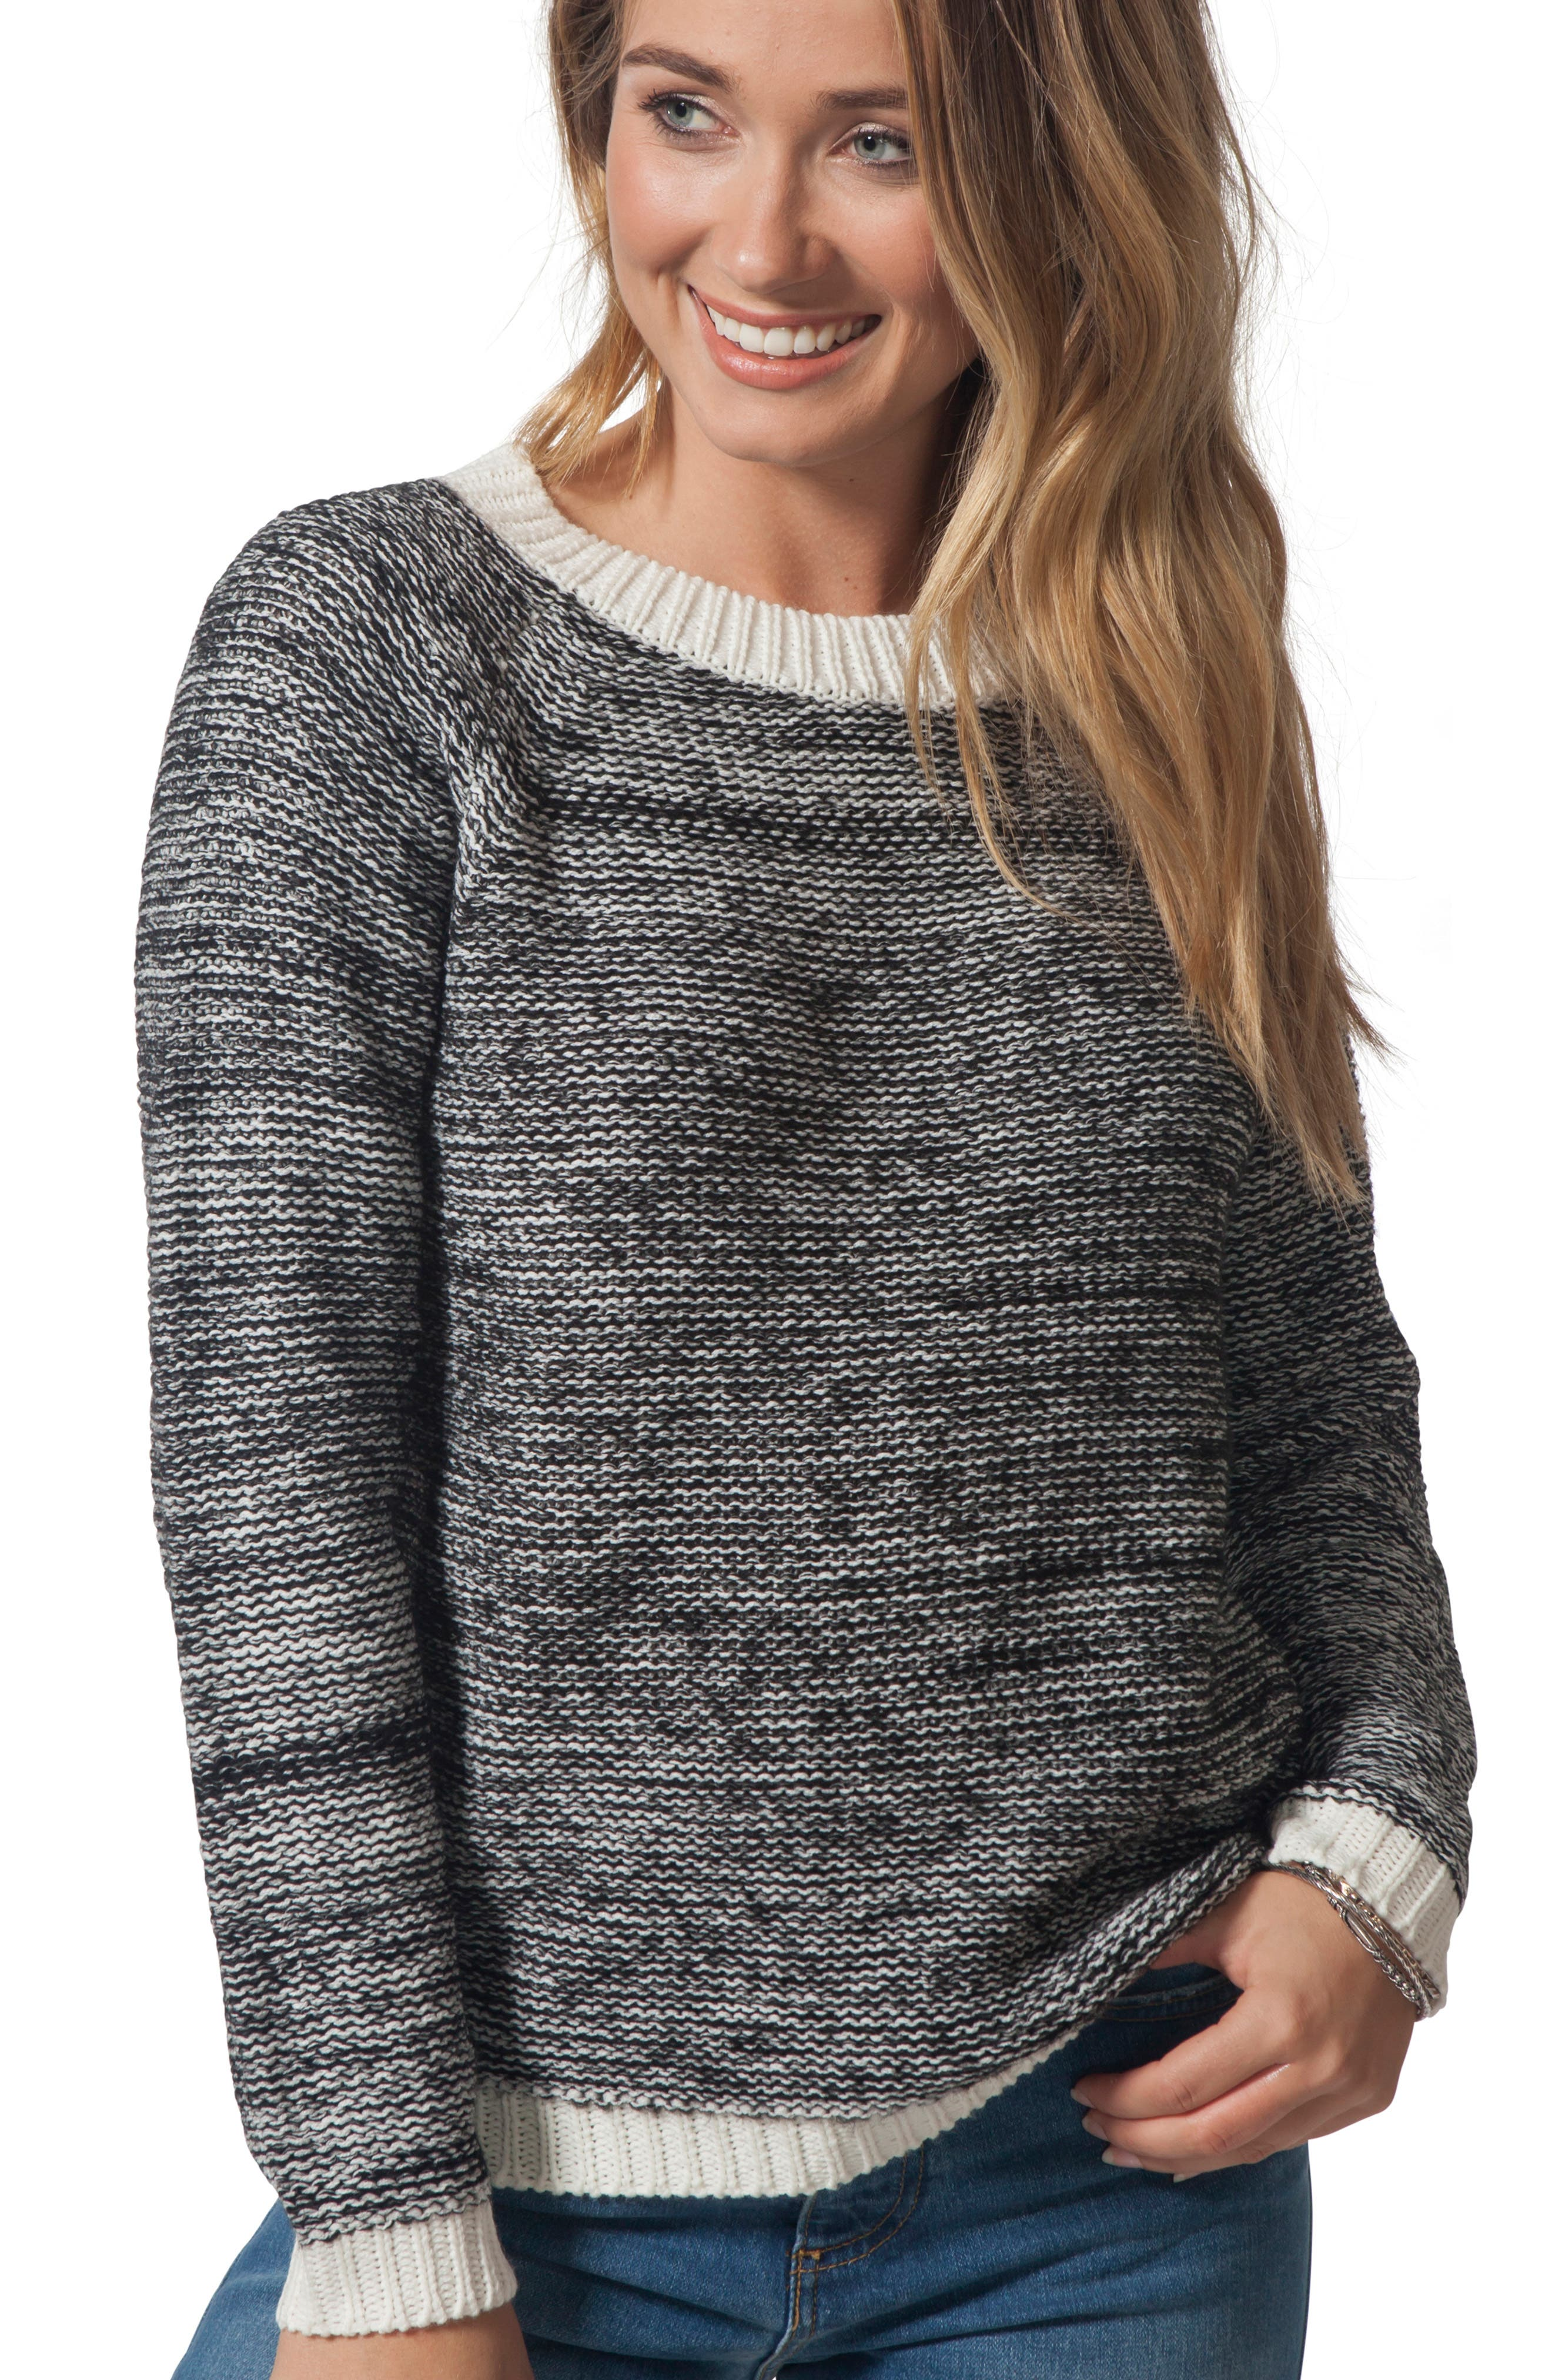 Beachside Crewneck Sweater,                             Alternate thumbnail 4, color,                             CASTOR GRAY